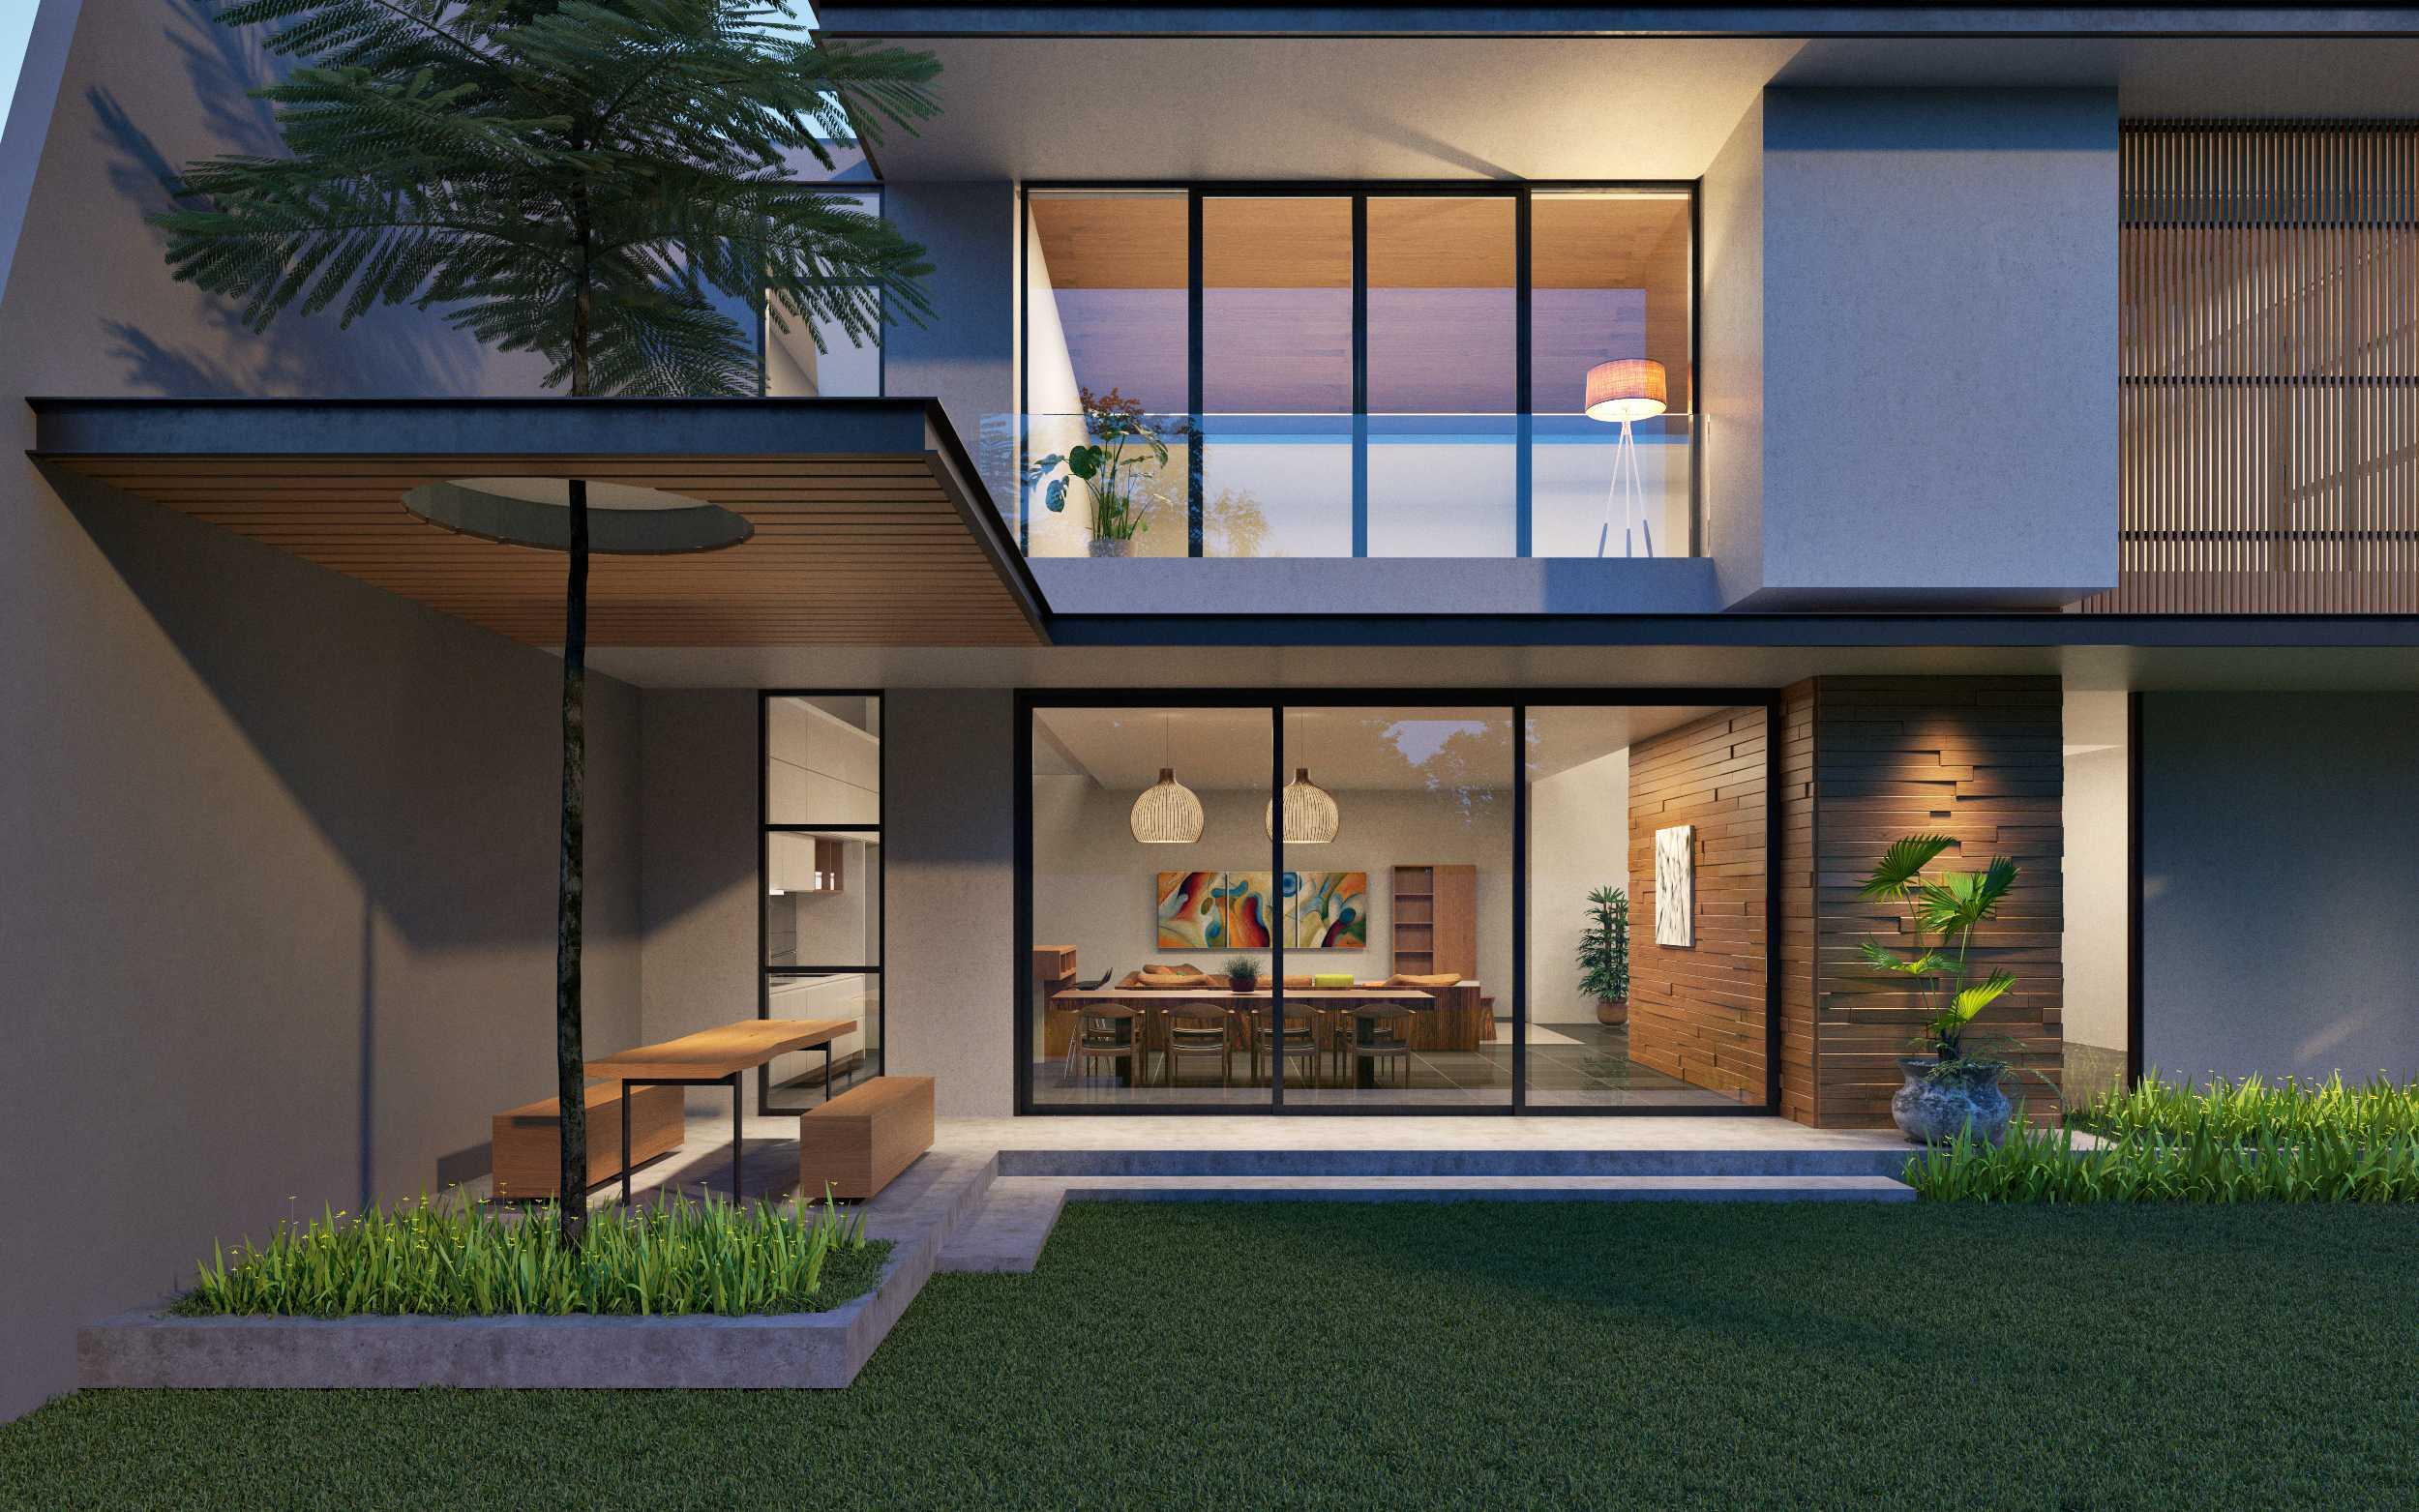 Erwin Kusuma K-15 House Ciumbuleuit, Cidadap, Kota Bandung, Jawa Barat, Indonesia Ciumbuleuit, Cidadap, Kota Bandung, Jawa Barat, Indonesia Erwin-Kusuma-K-15-House   70277